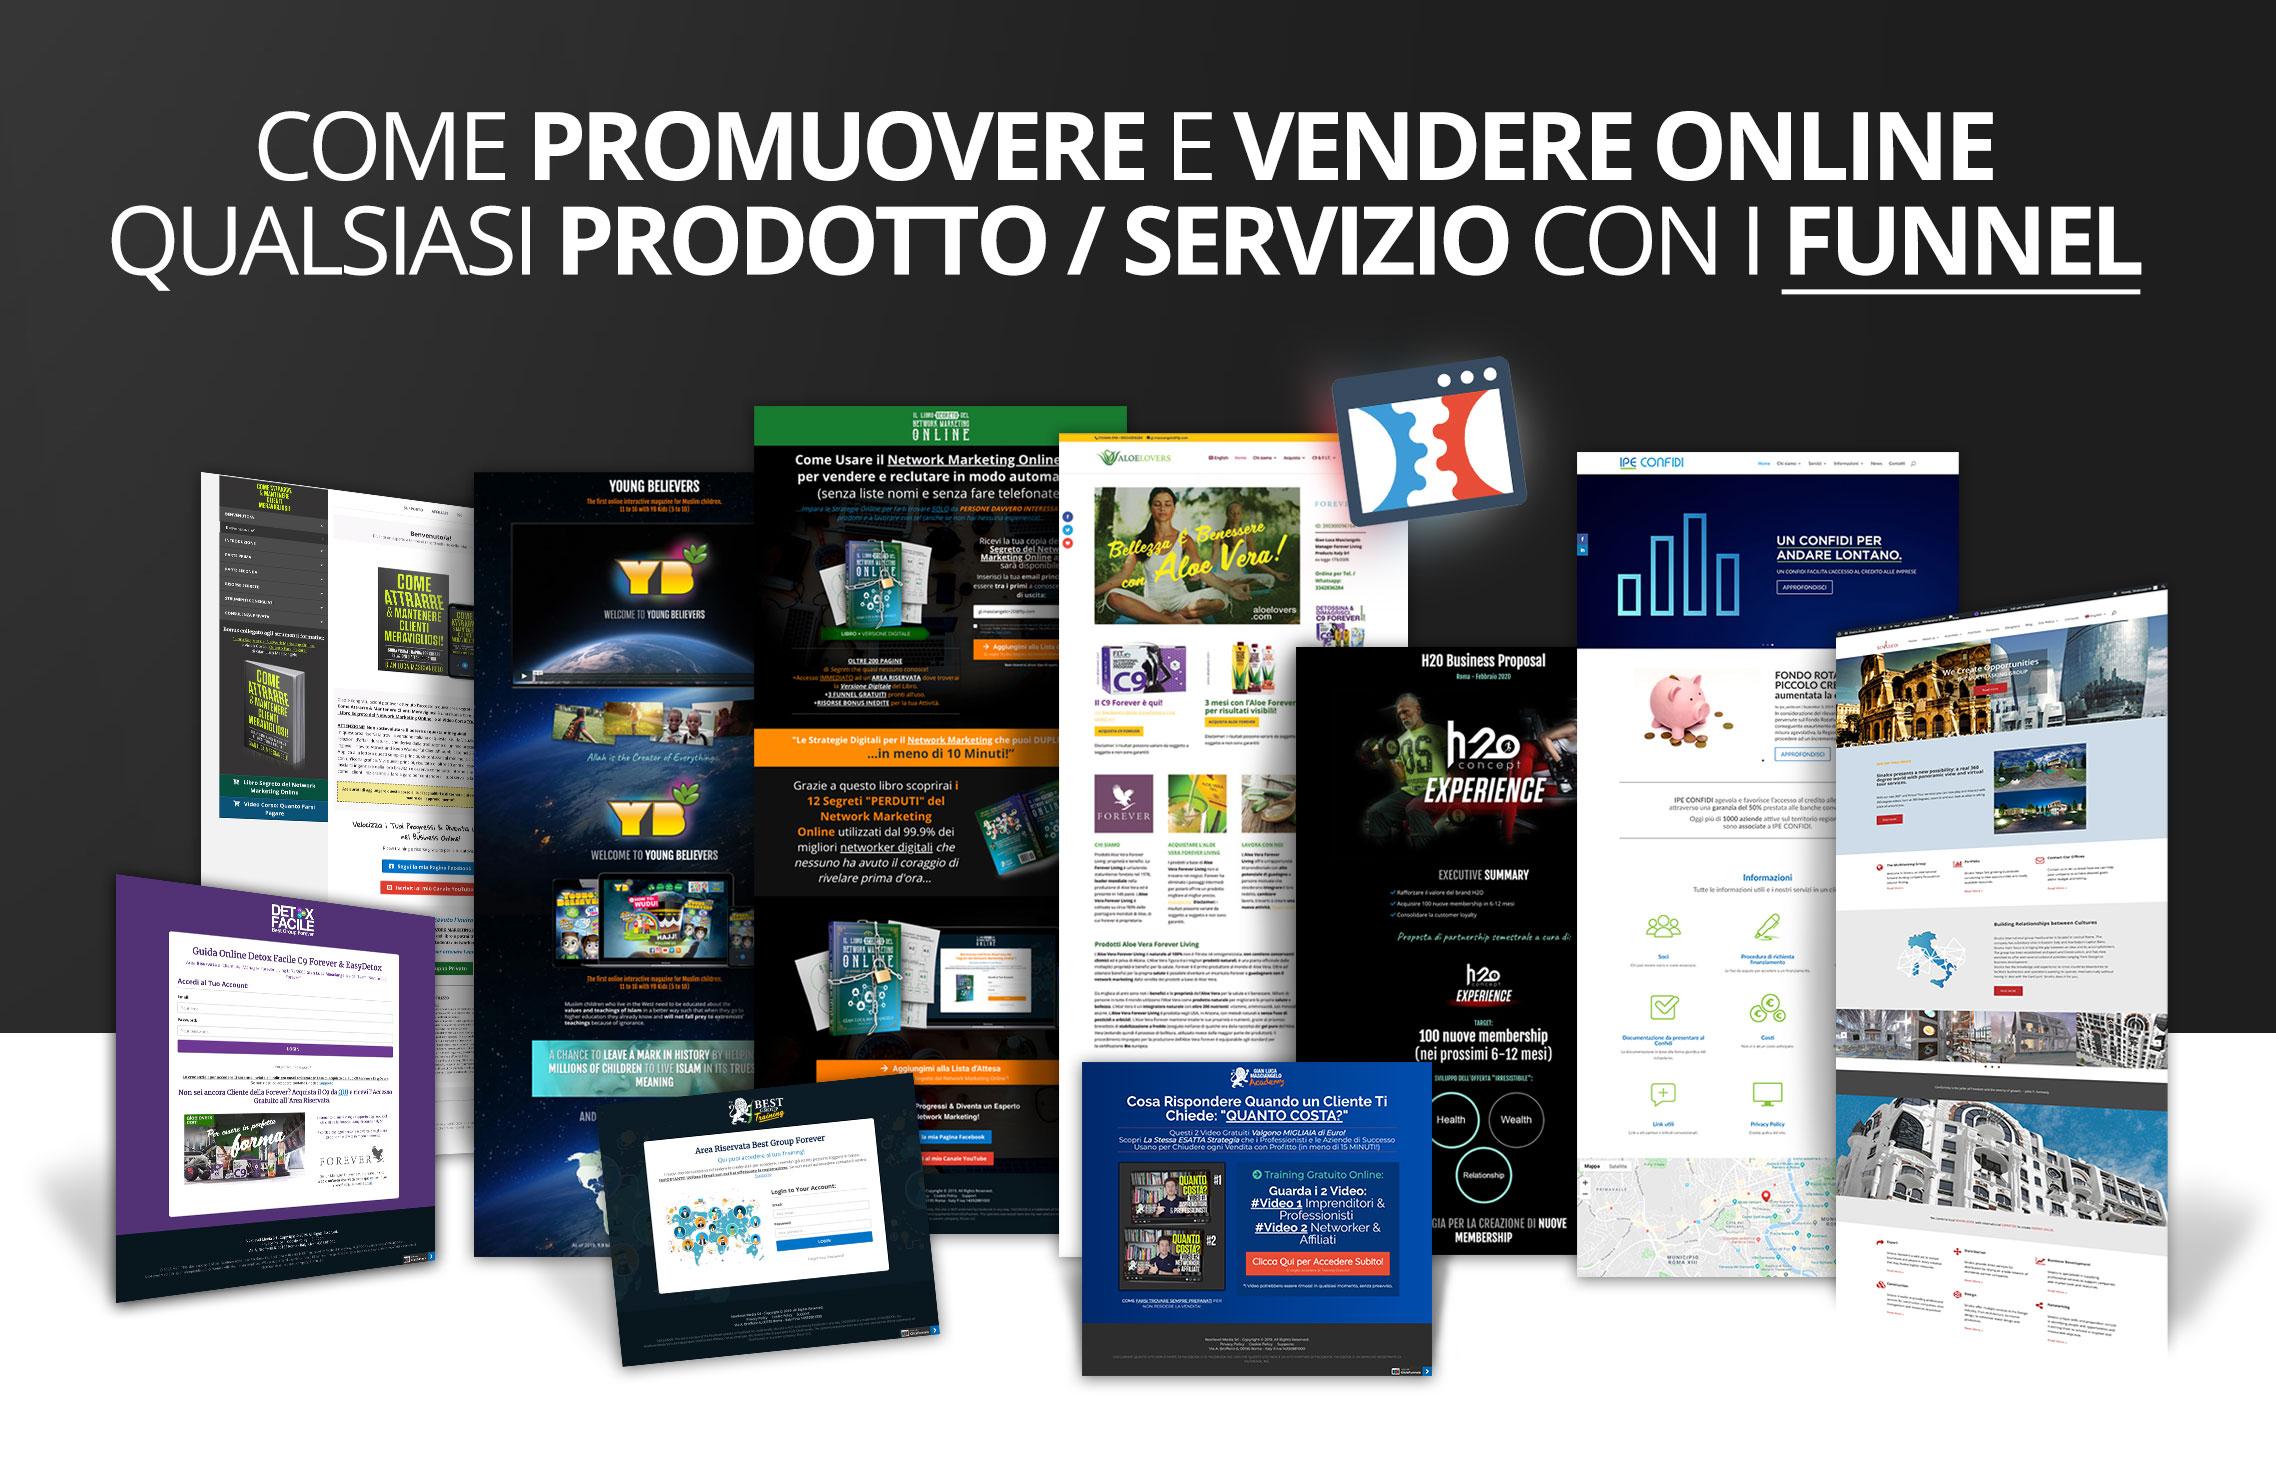 Funnel-marketing-nextlevel-media-roma